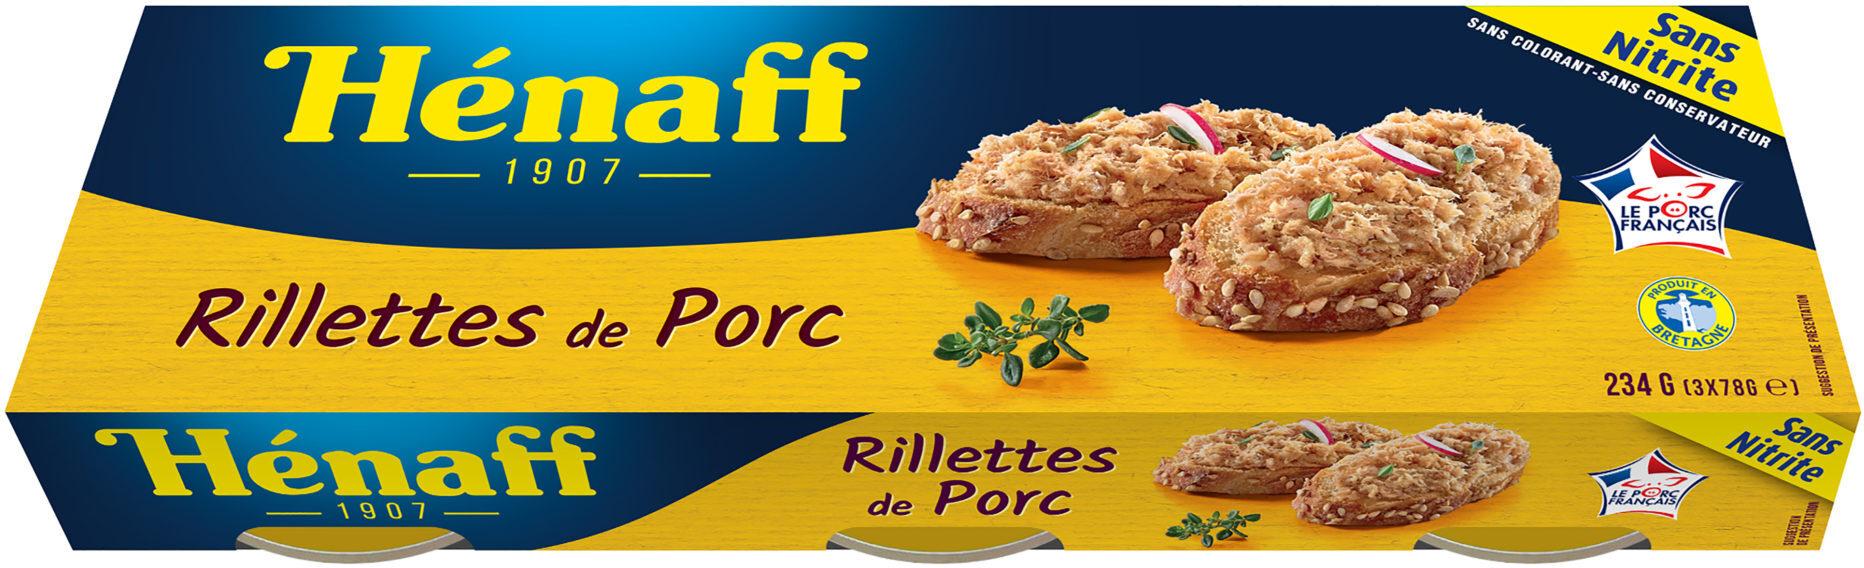 LOT RILLETTES de PORC Hénaff - Produit - fr